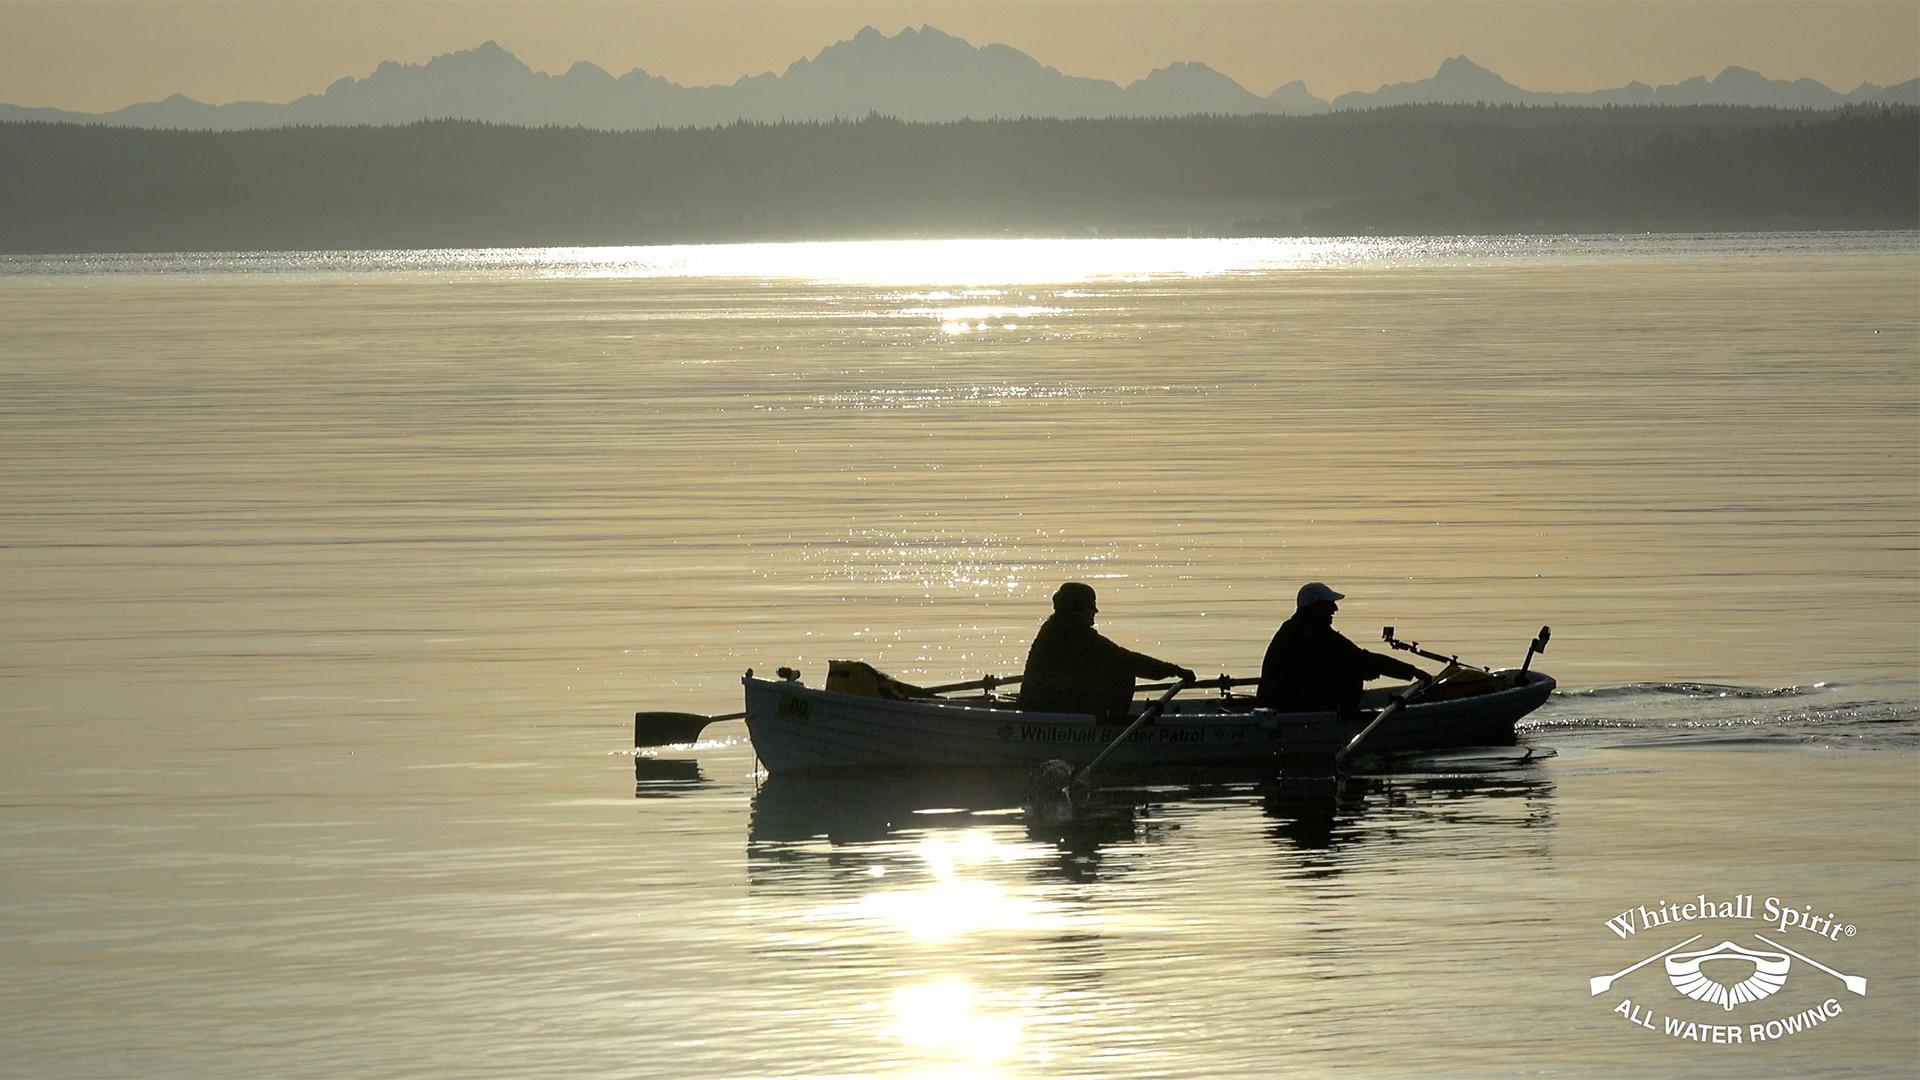 Seventy48-Race-Port-Townsend-Tacoma-Whitehall-Rowing-Border-Partol